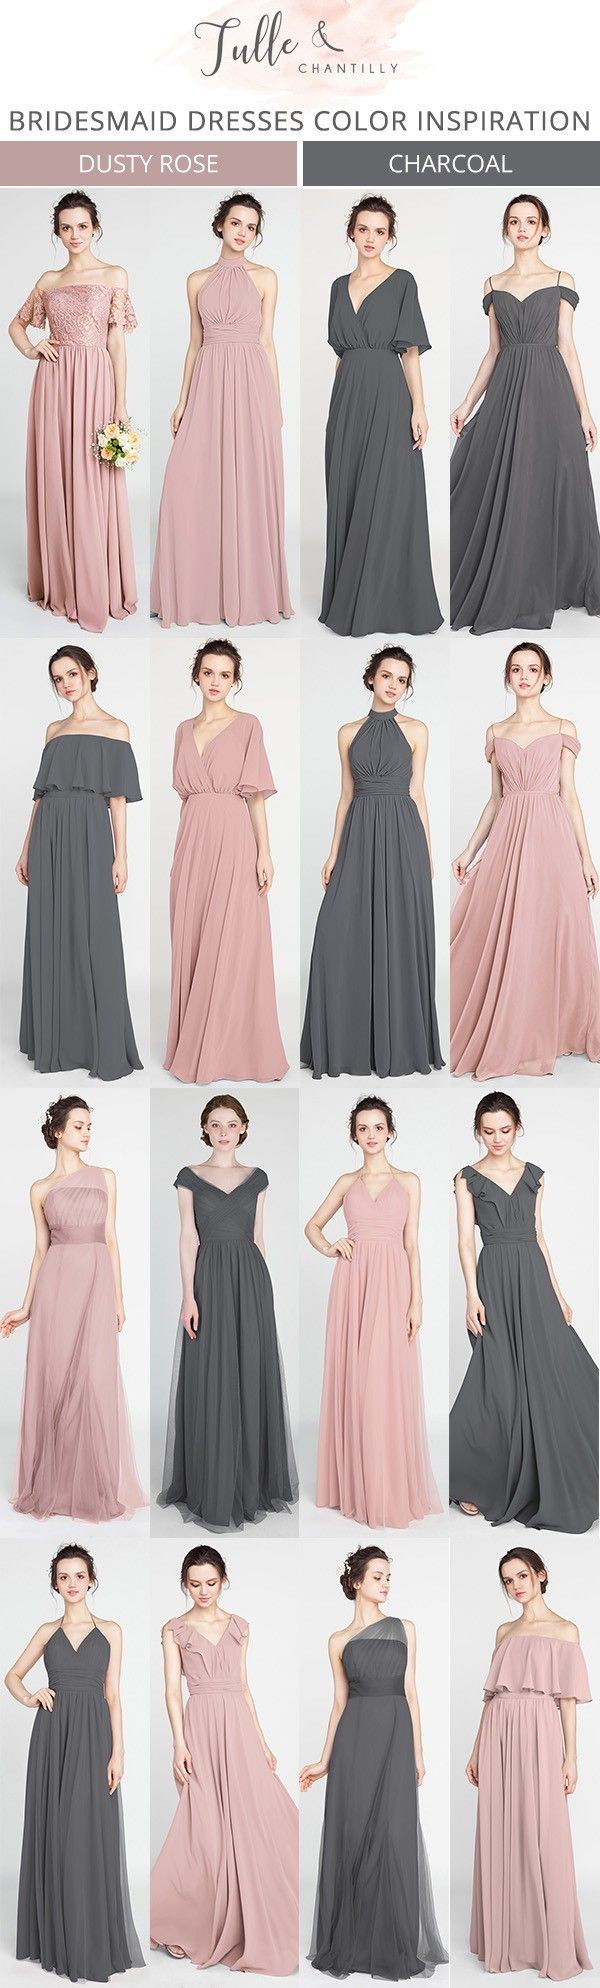 dusty rose and charcoal grey bridesmaid dresses #bridalparty #bridesmaiddresses #weddinginspiration #weddingcolors